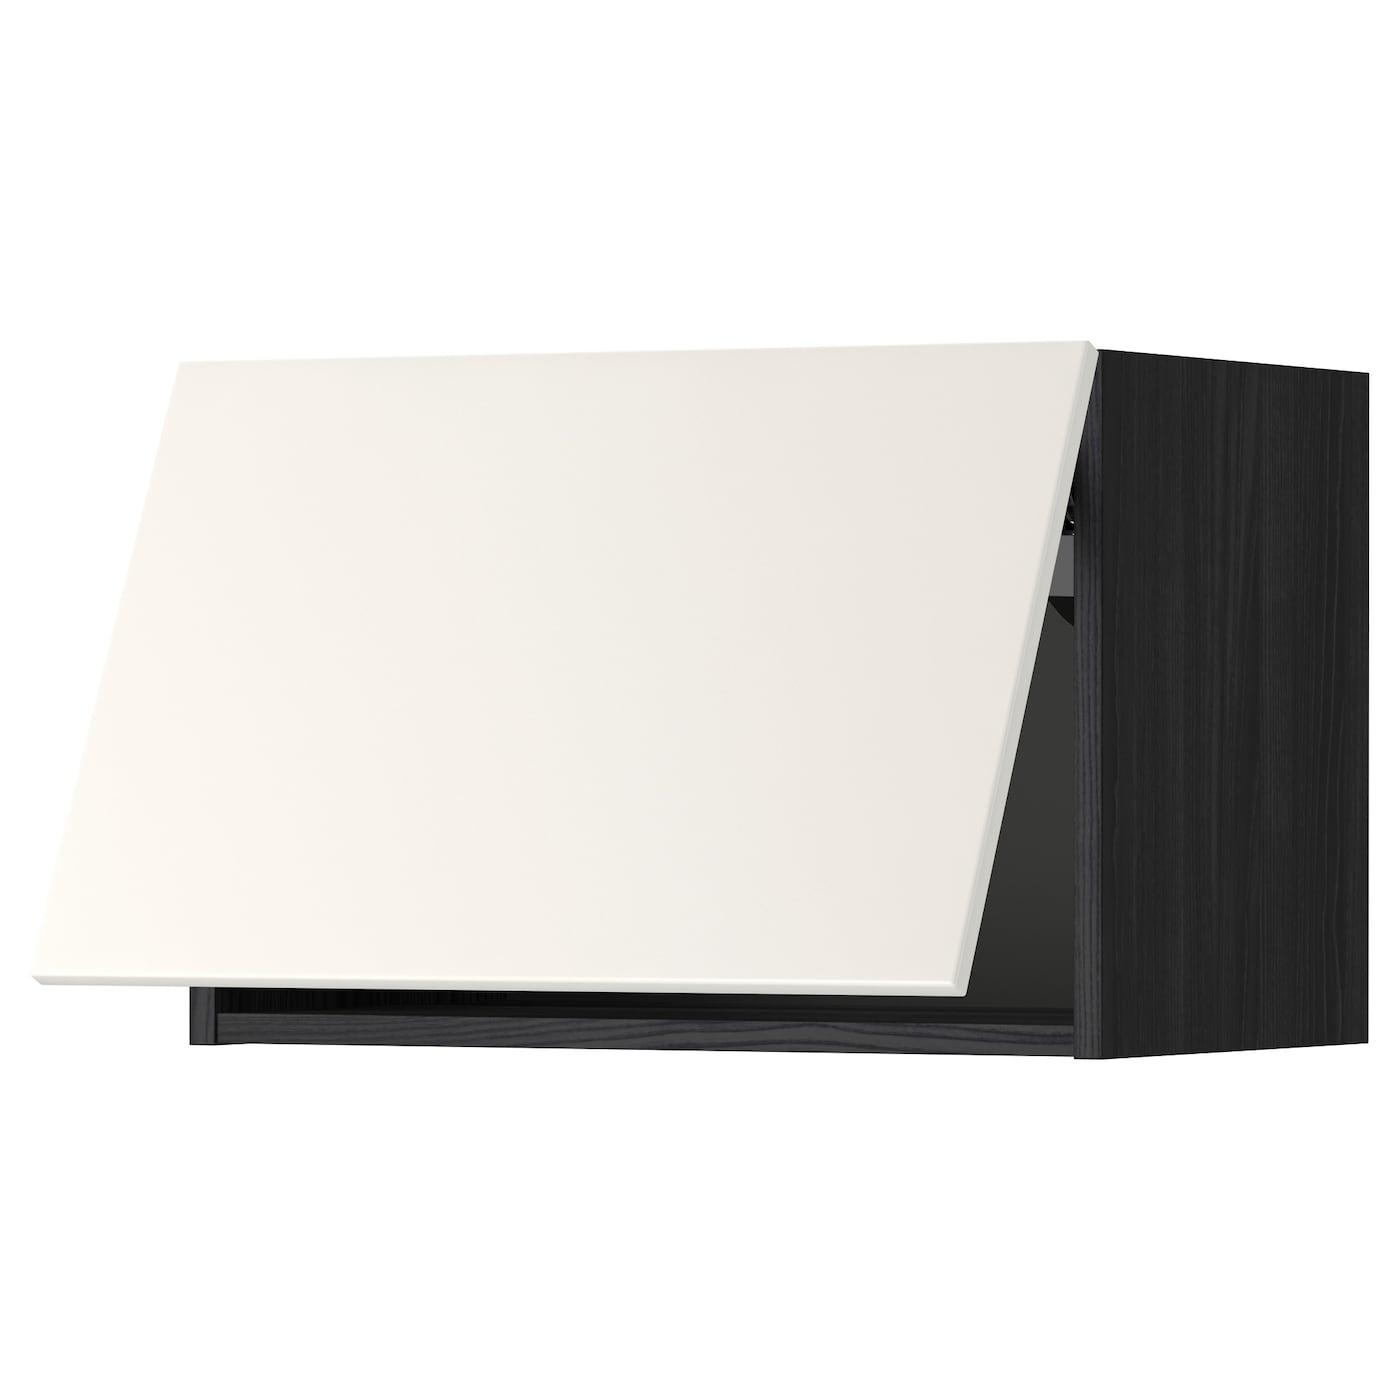 METOD, Wandschrank horizontal, schwarz 999.179.12